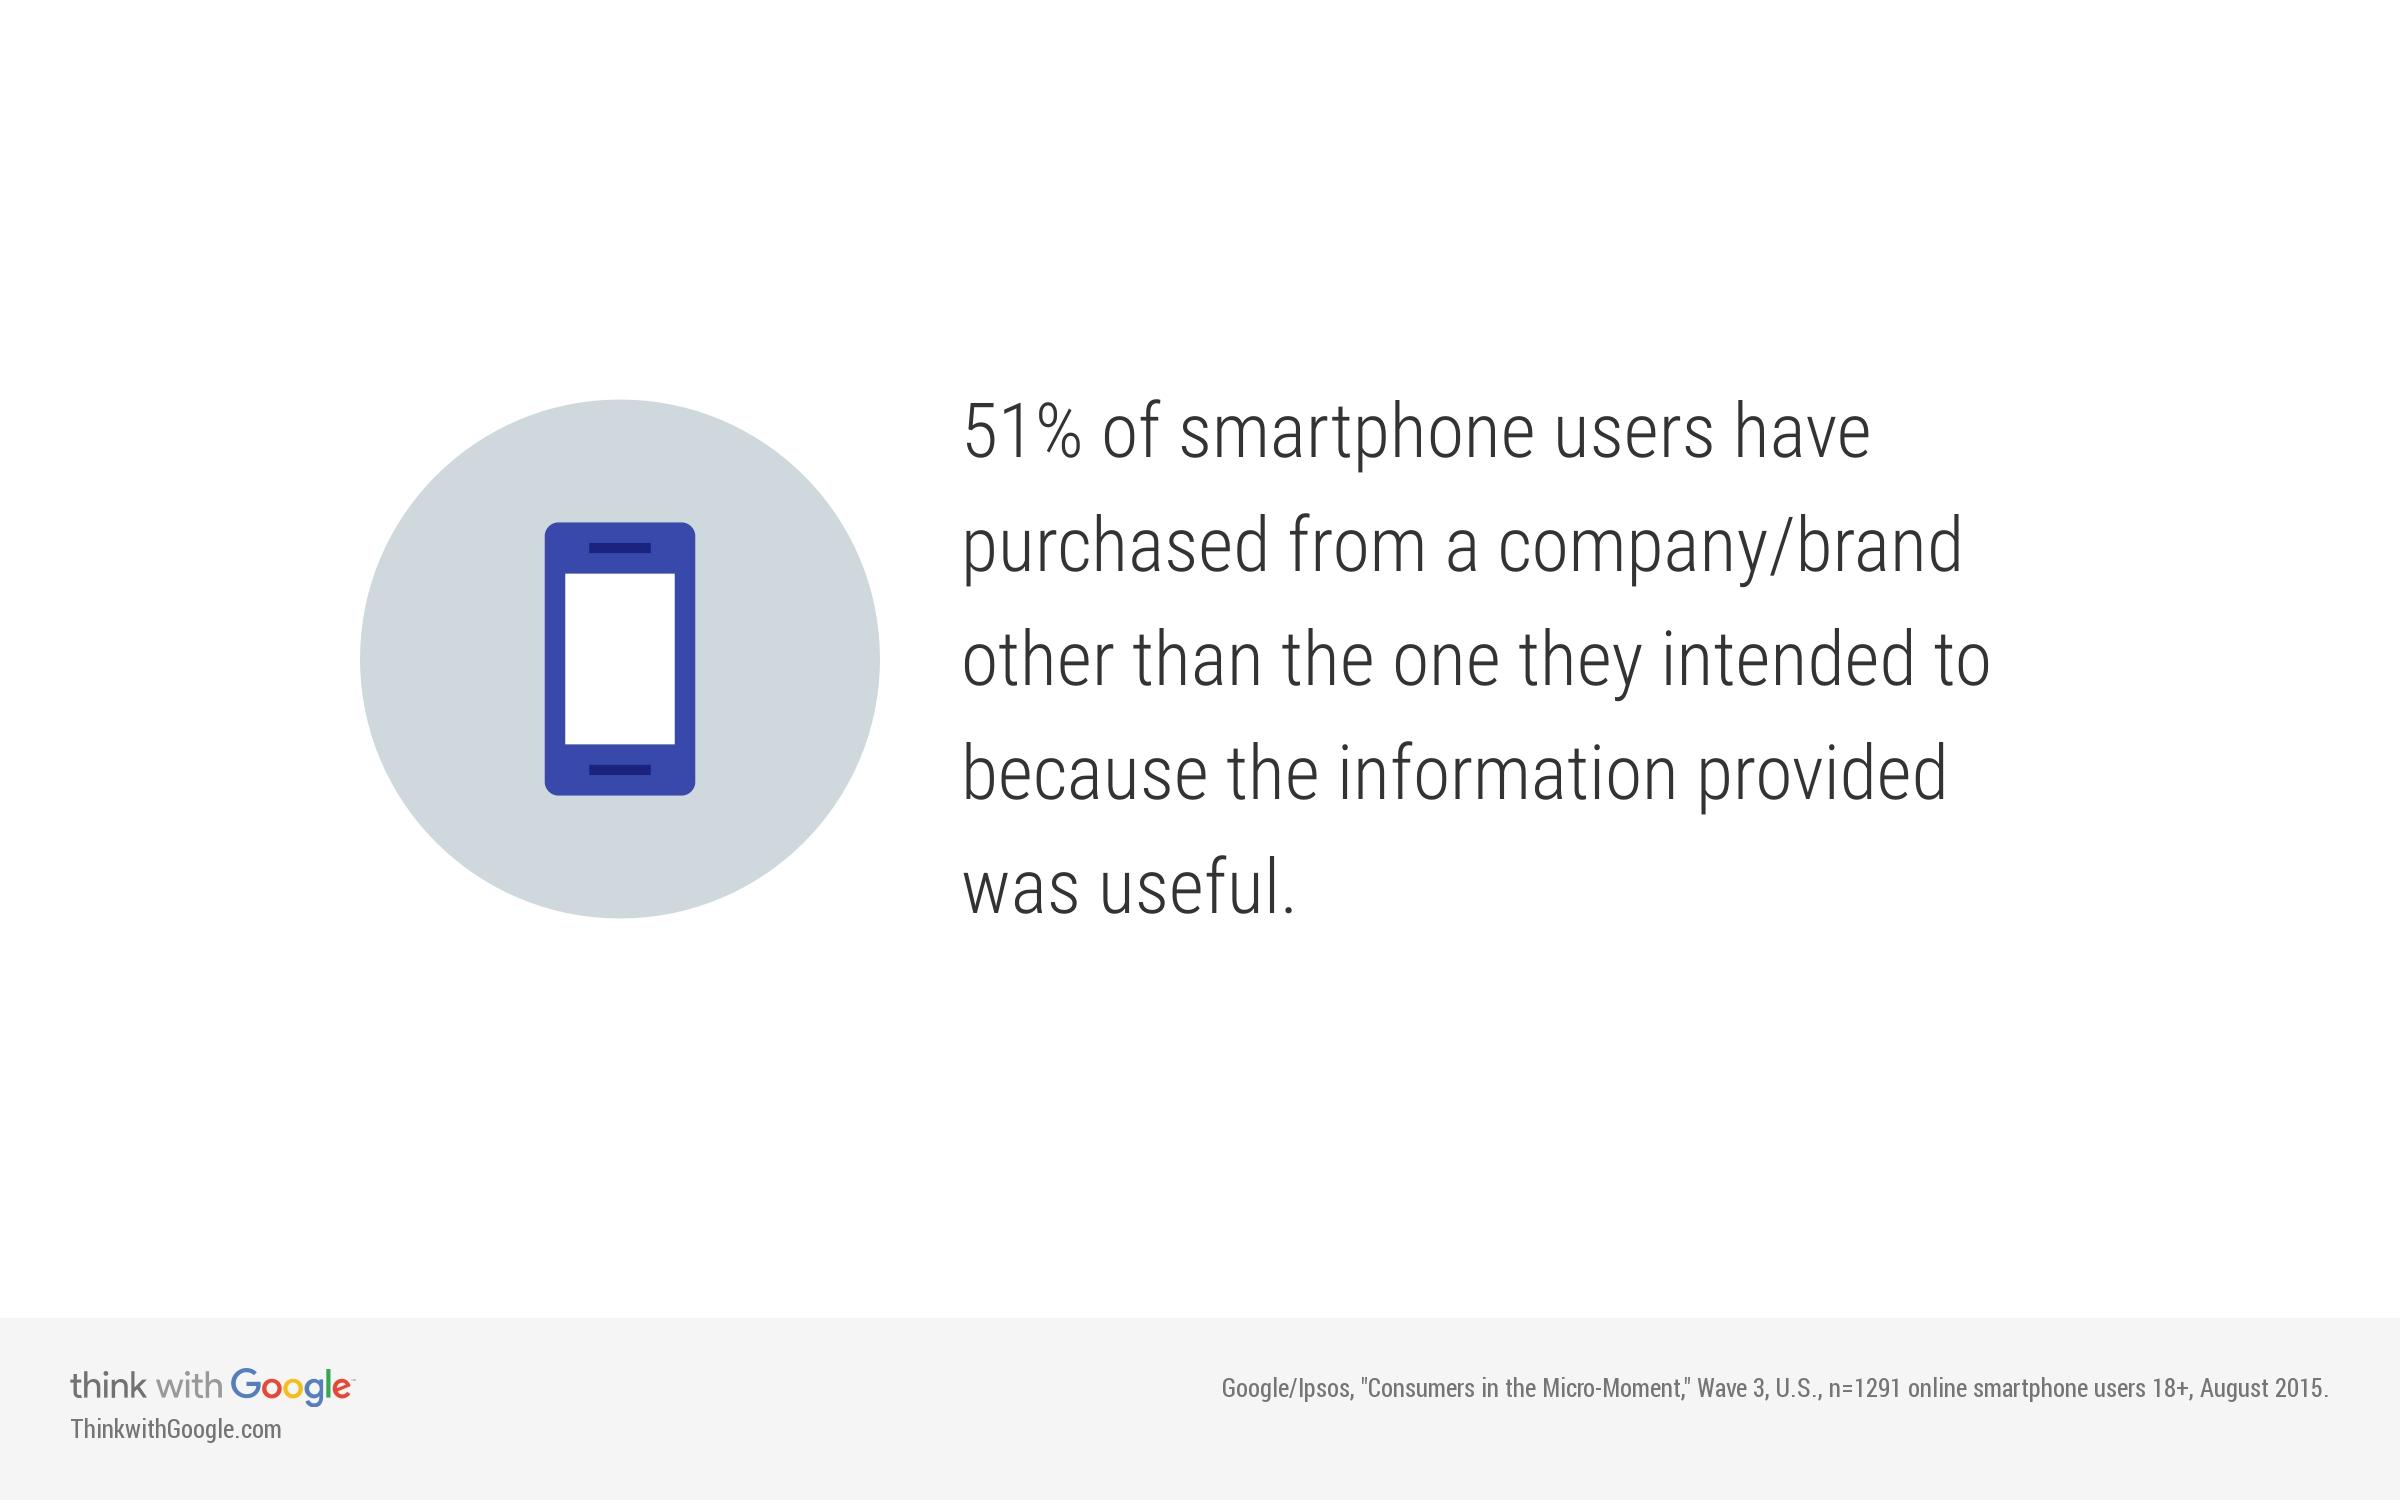 eroding-brand-loyalty-information-2015.jpg